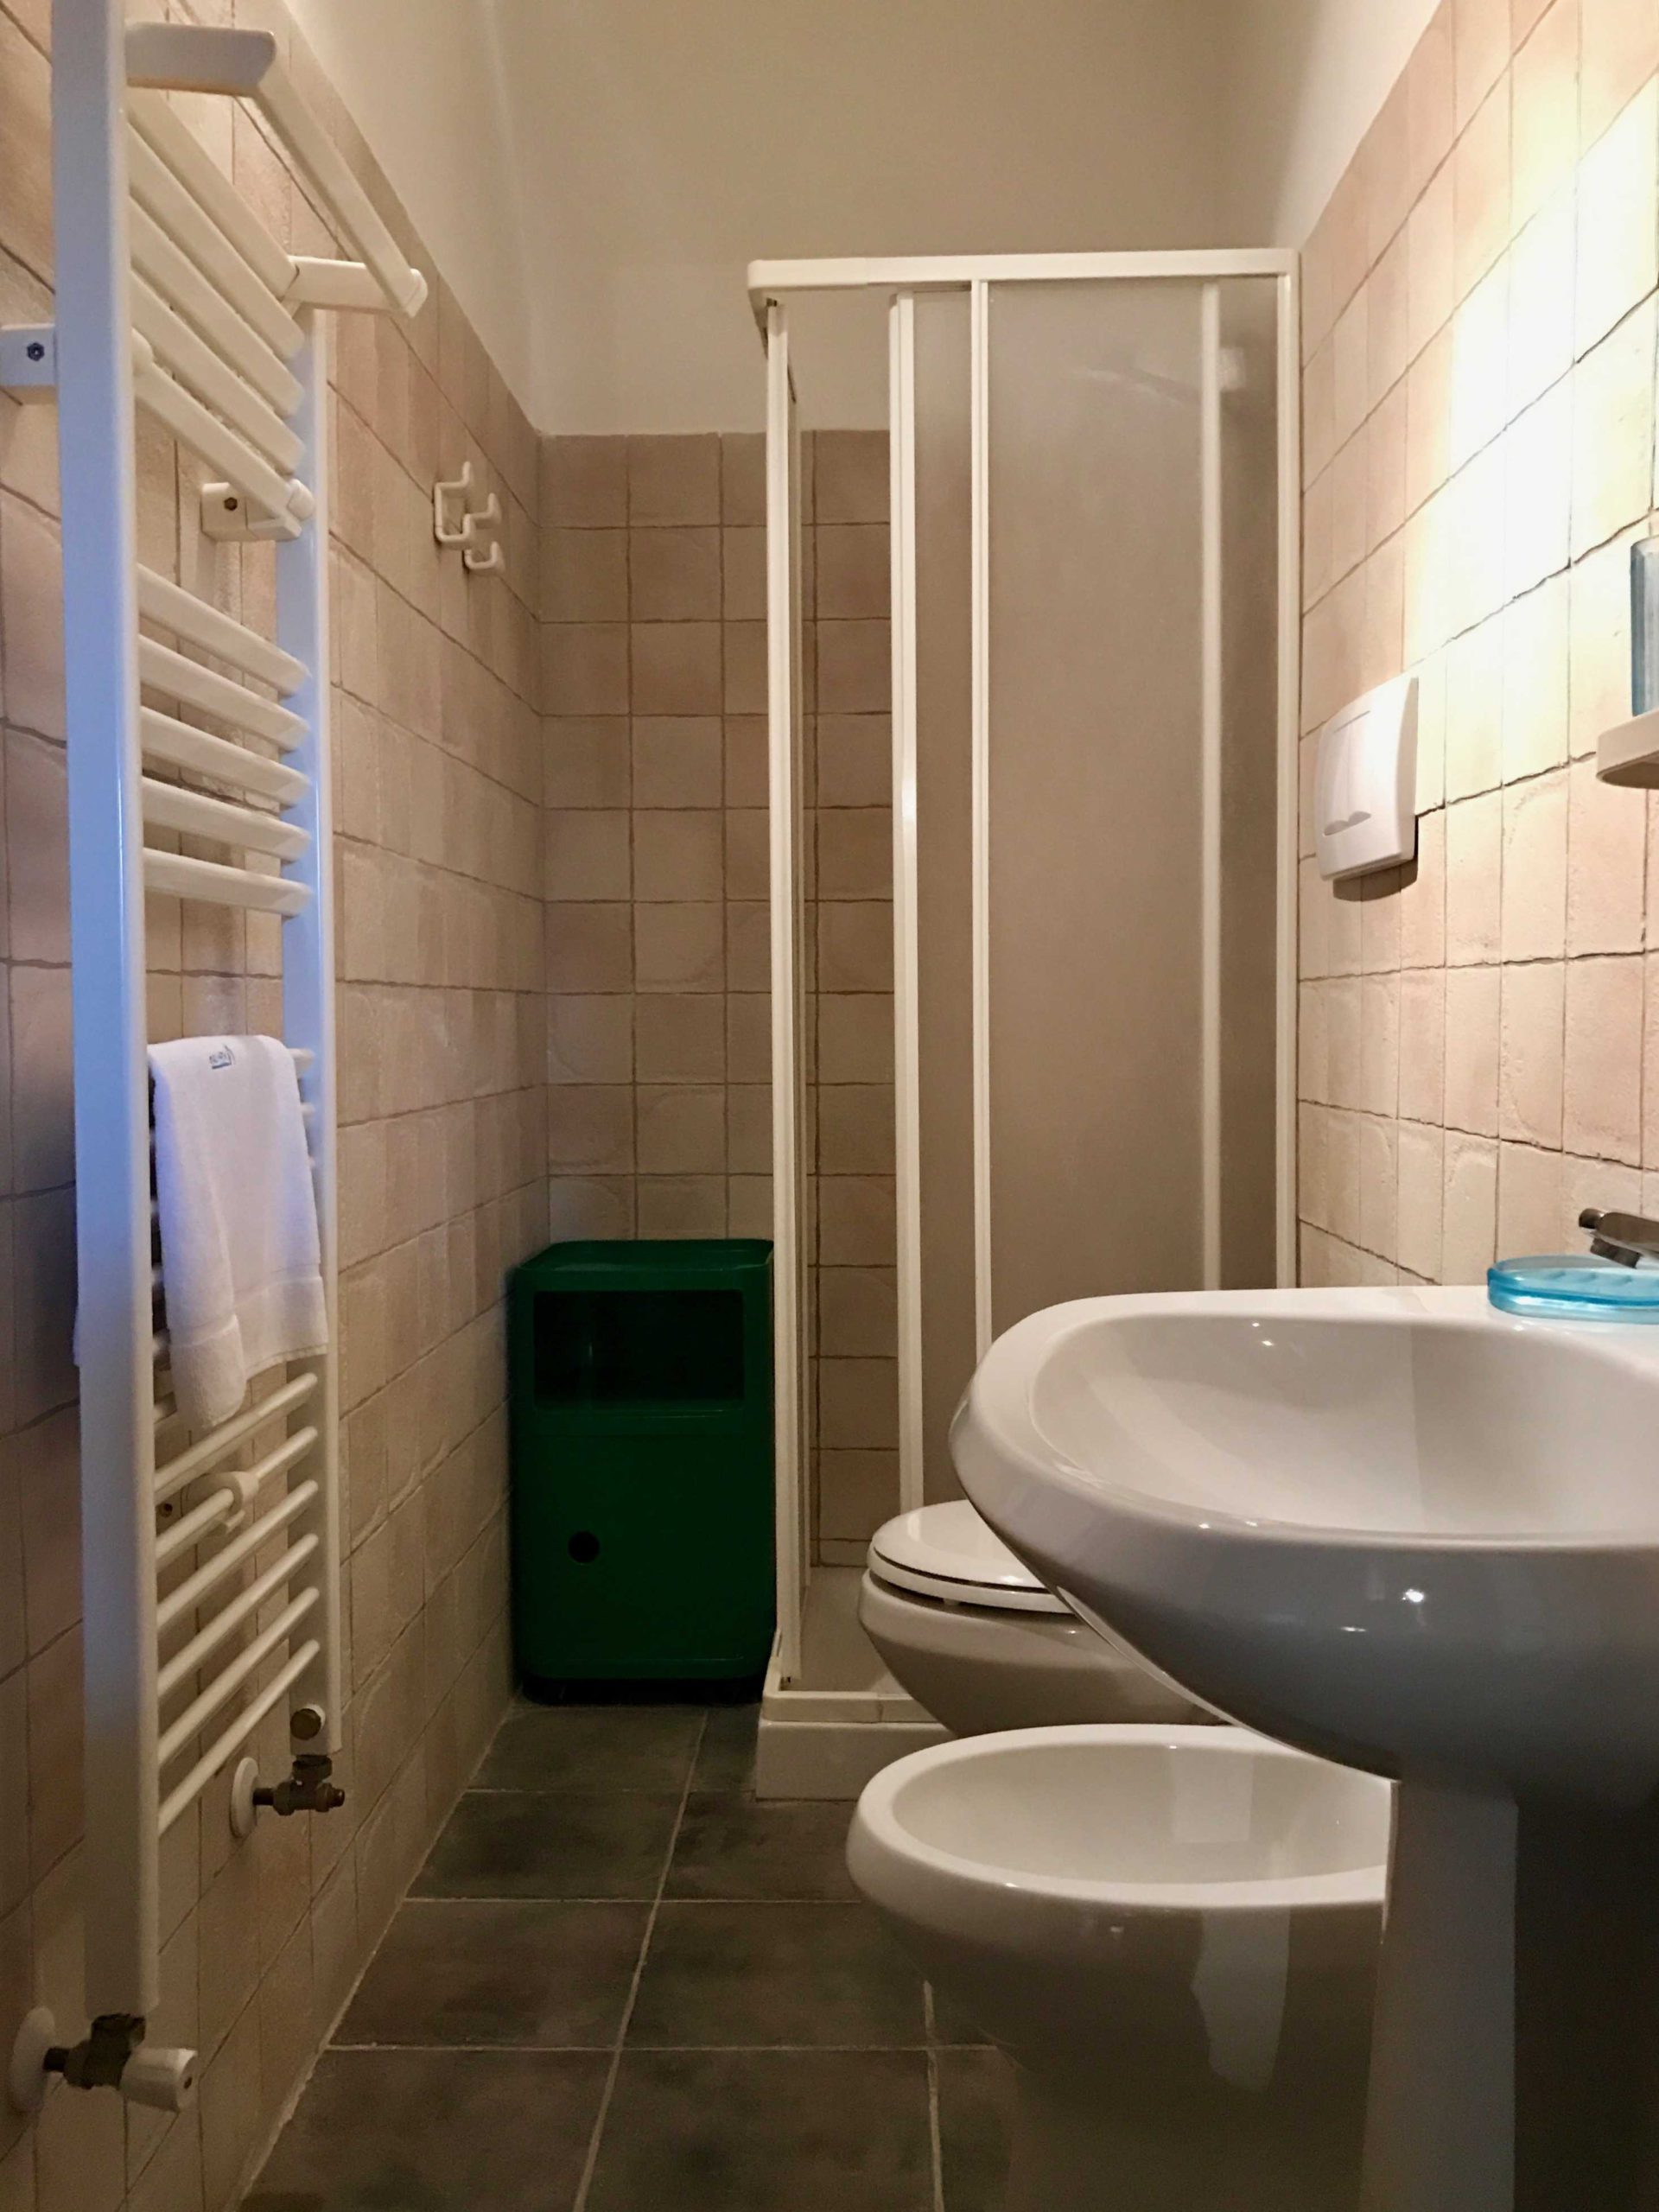 Ciliegi badkamer